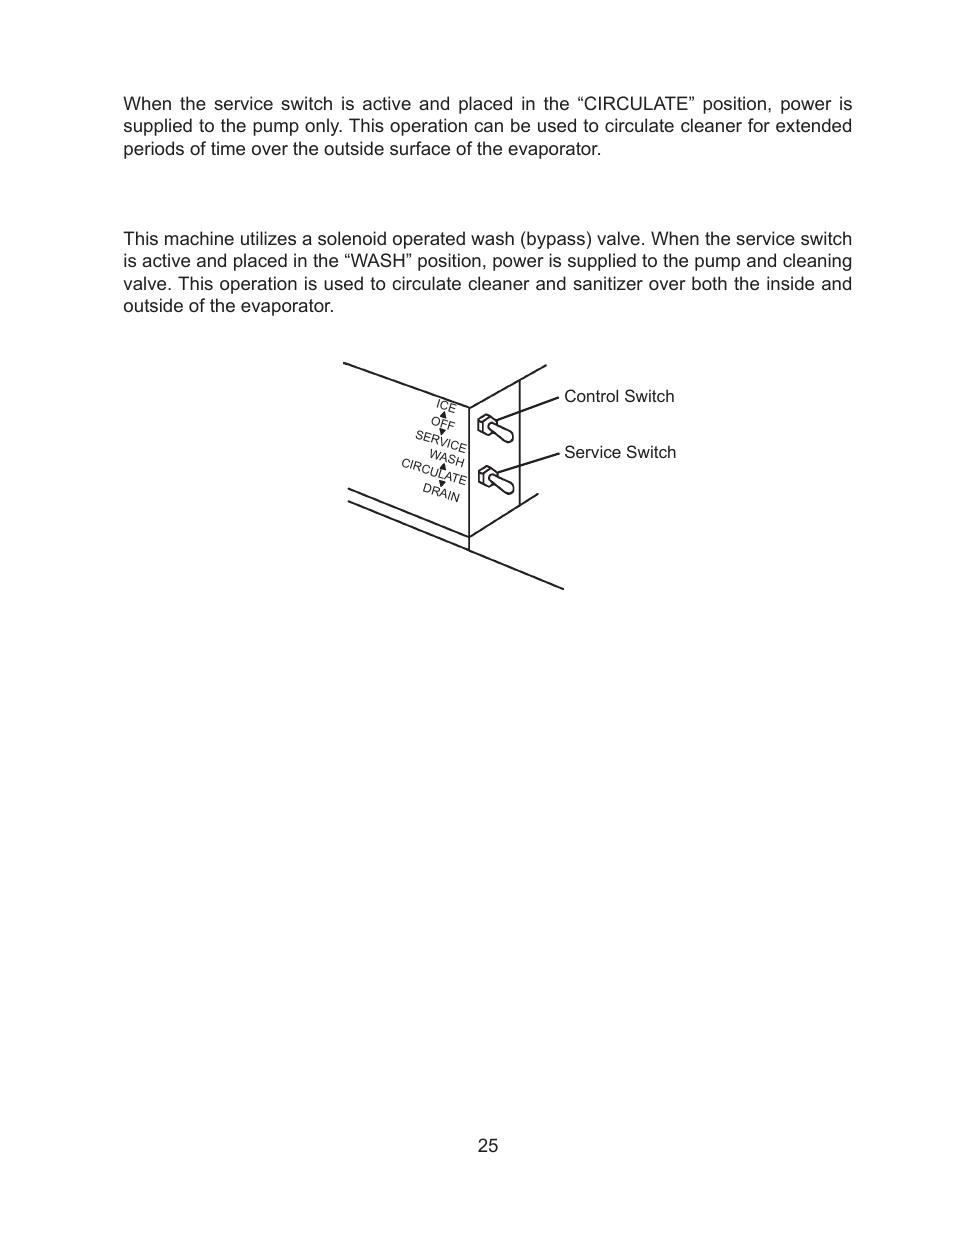 fig 3 hoshizaki km 260bah user manual page 30 81 original mode rh manualsdir com Hoshizaki Ice Machine Troubleshooting Hoshizaki 451 Mah Service Manual